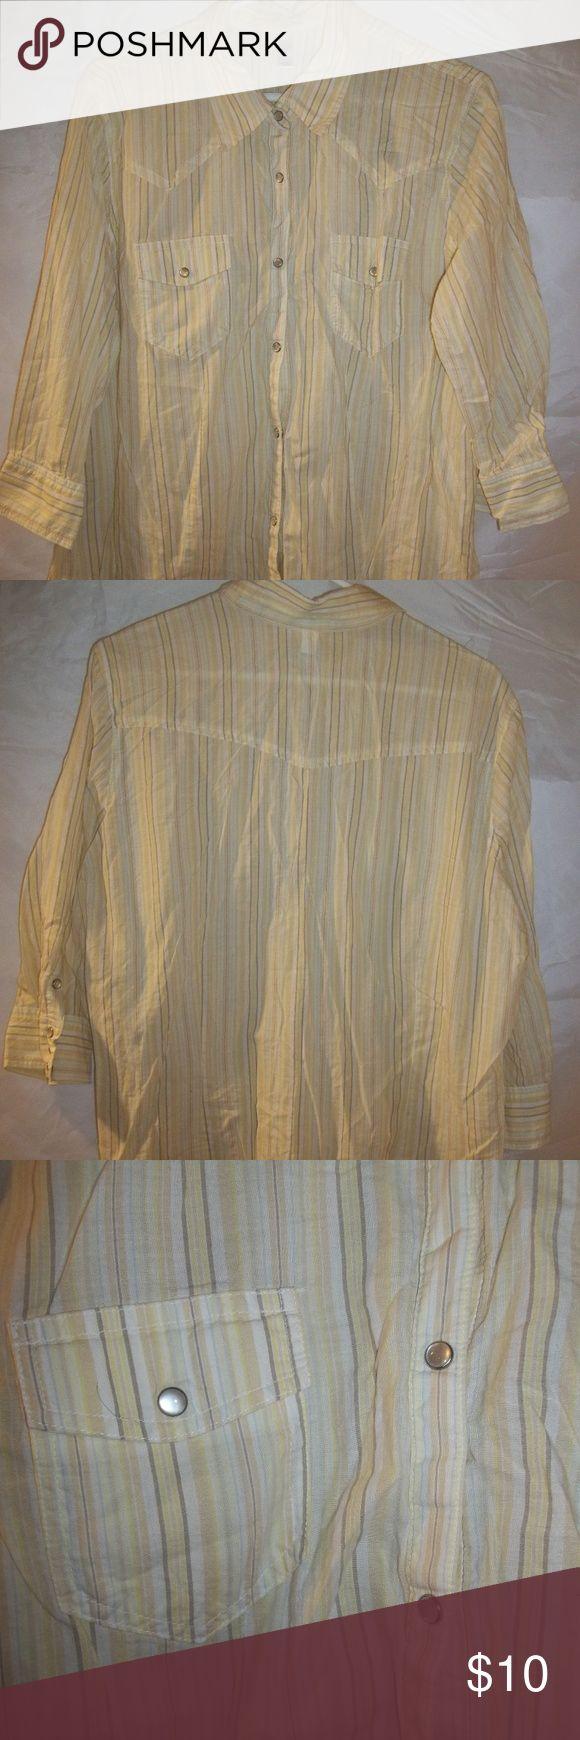 I just added this listing on Poshmark: Old Navy Western Pearl Snap Shirt Plus Size XXL  #shopmycloset #poshmark #fashion #shopping #style #forsale #OldNavy #Tops #western #blouse #shirt #pearlsnap #striped #womens #clothing #clothes #apparel #poshmarkapp #poshmarkcloset